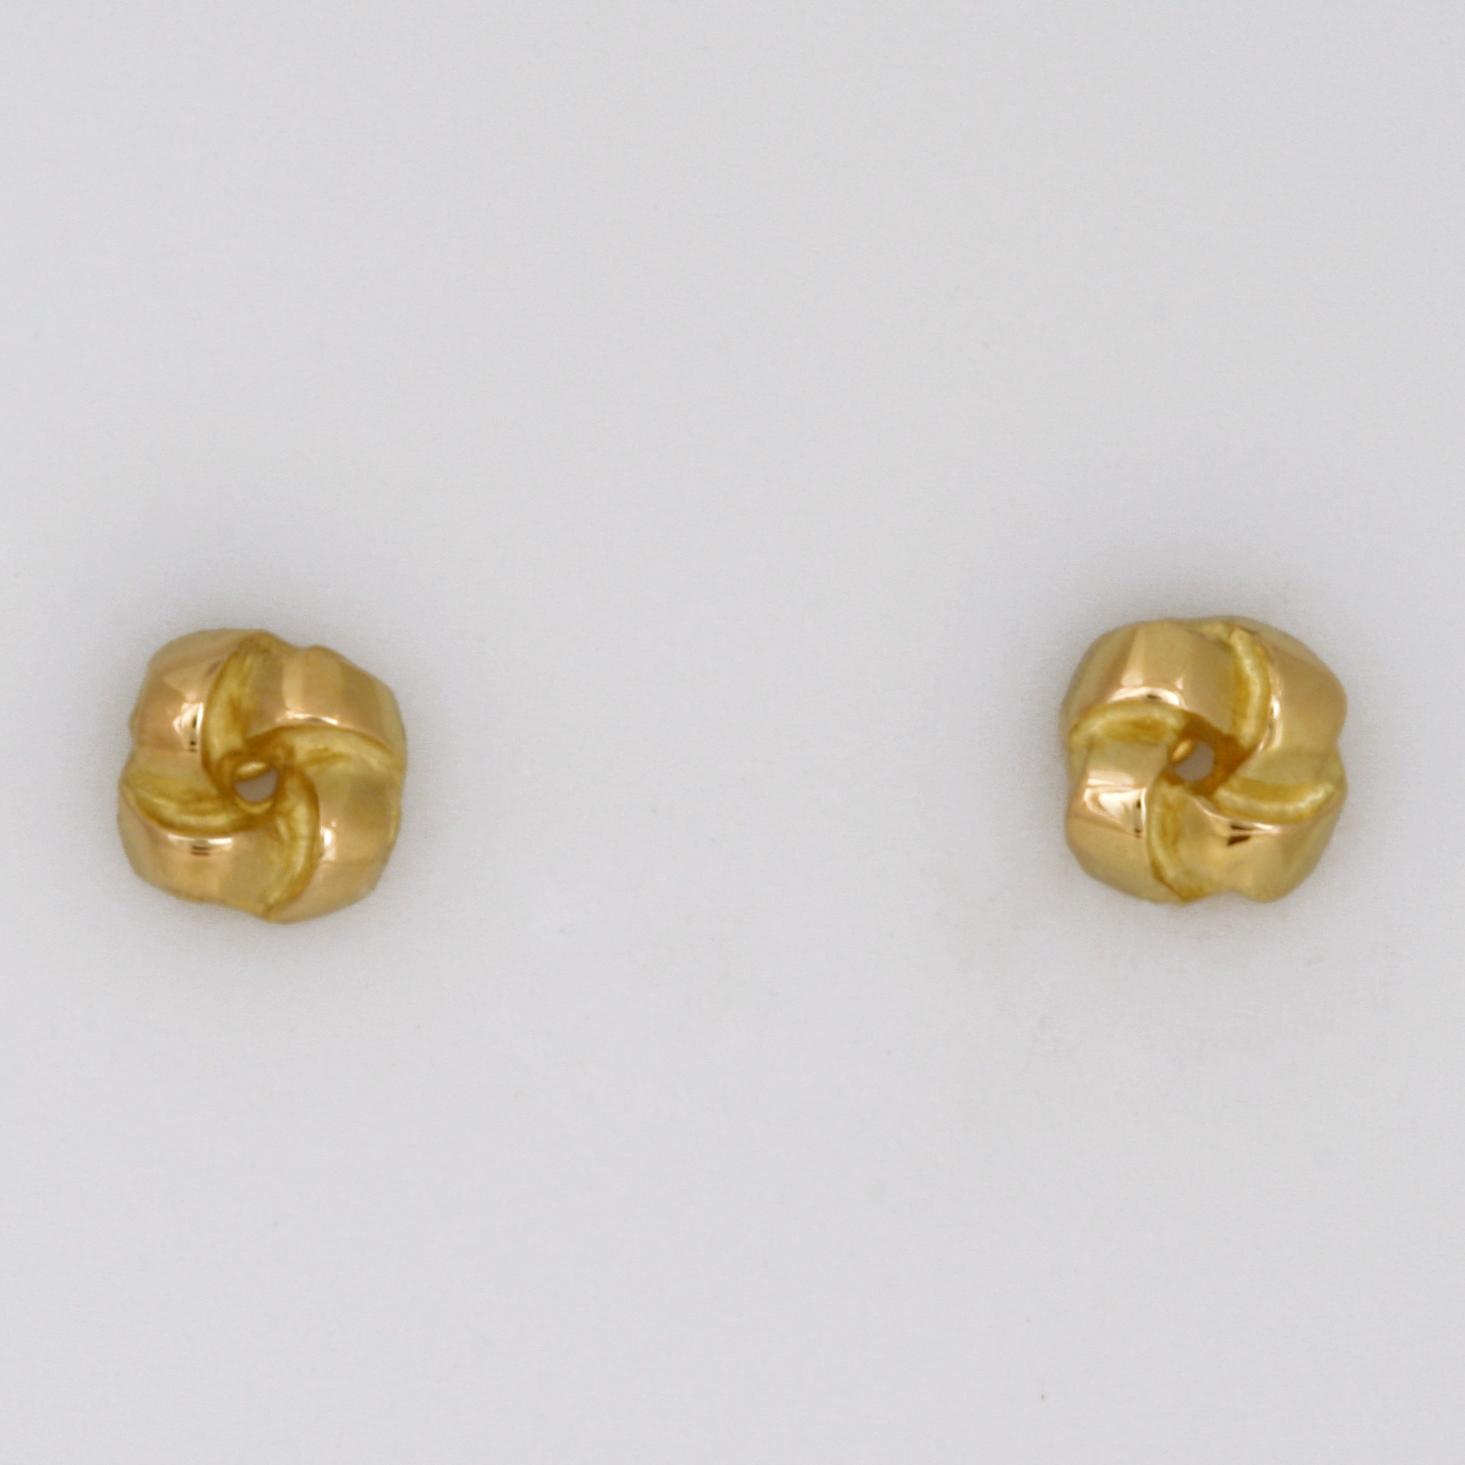 Handmade ladies 18ct yellow gold earrings